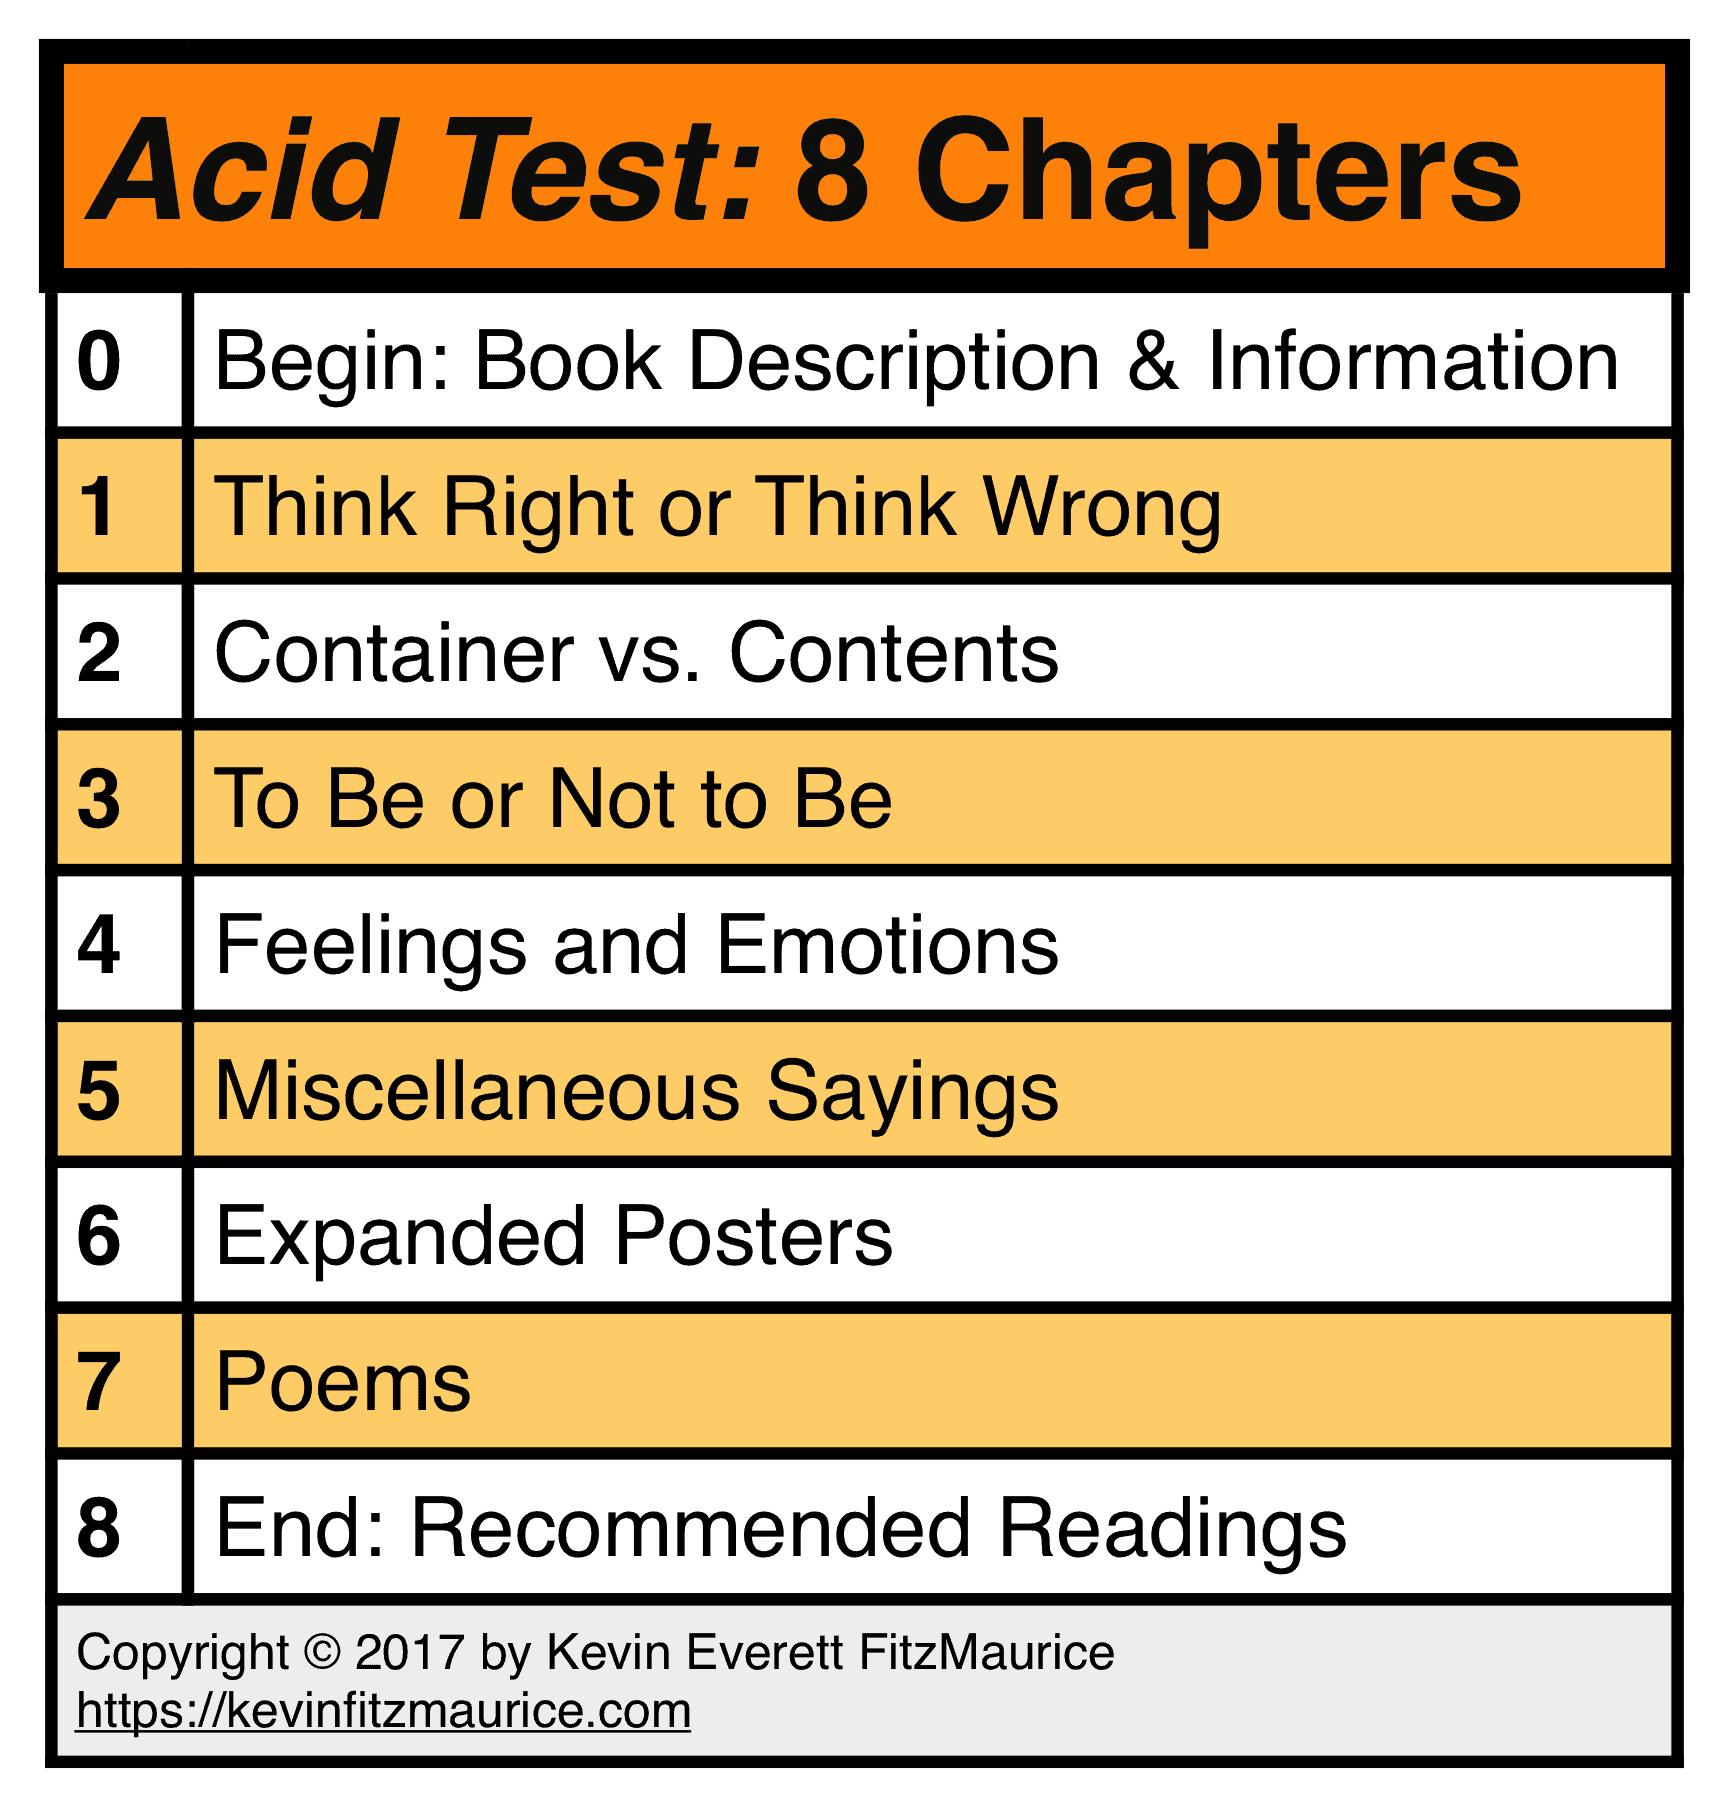 ACID TEST 8 Chapters